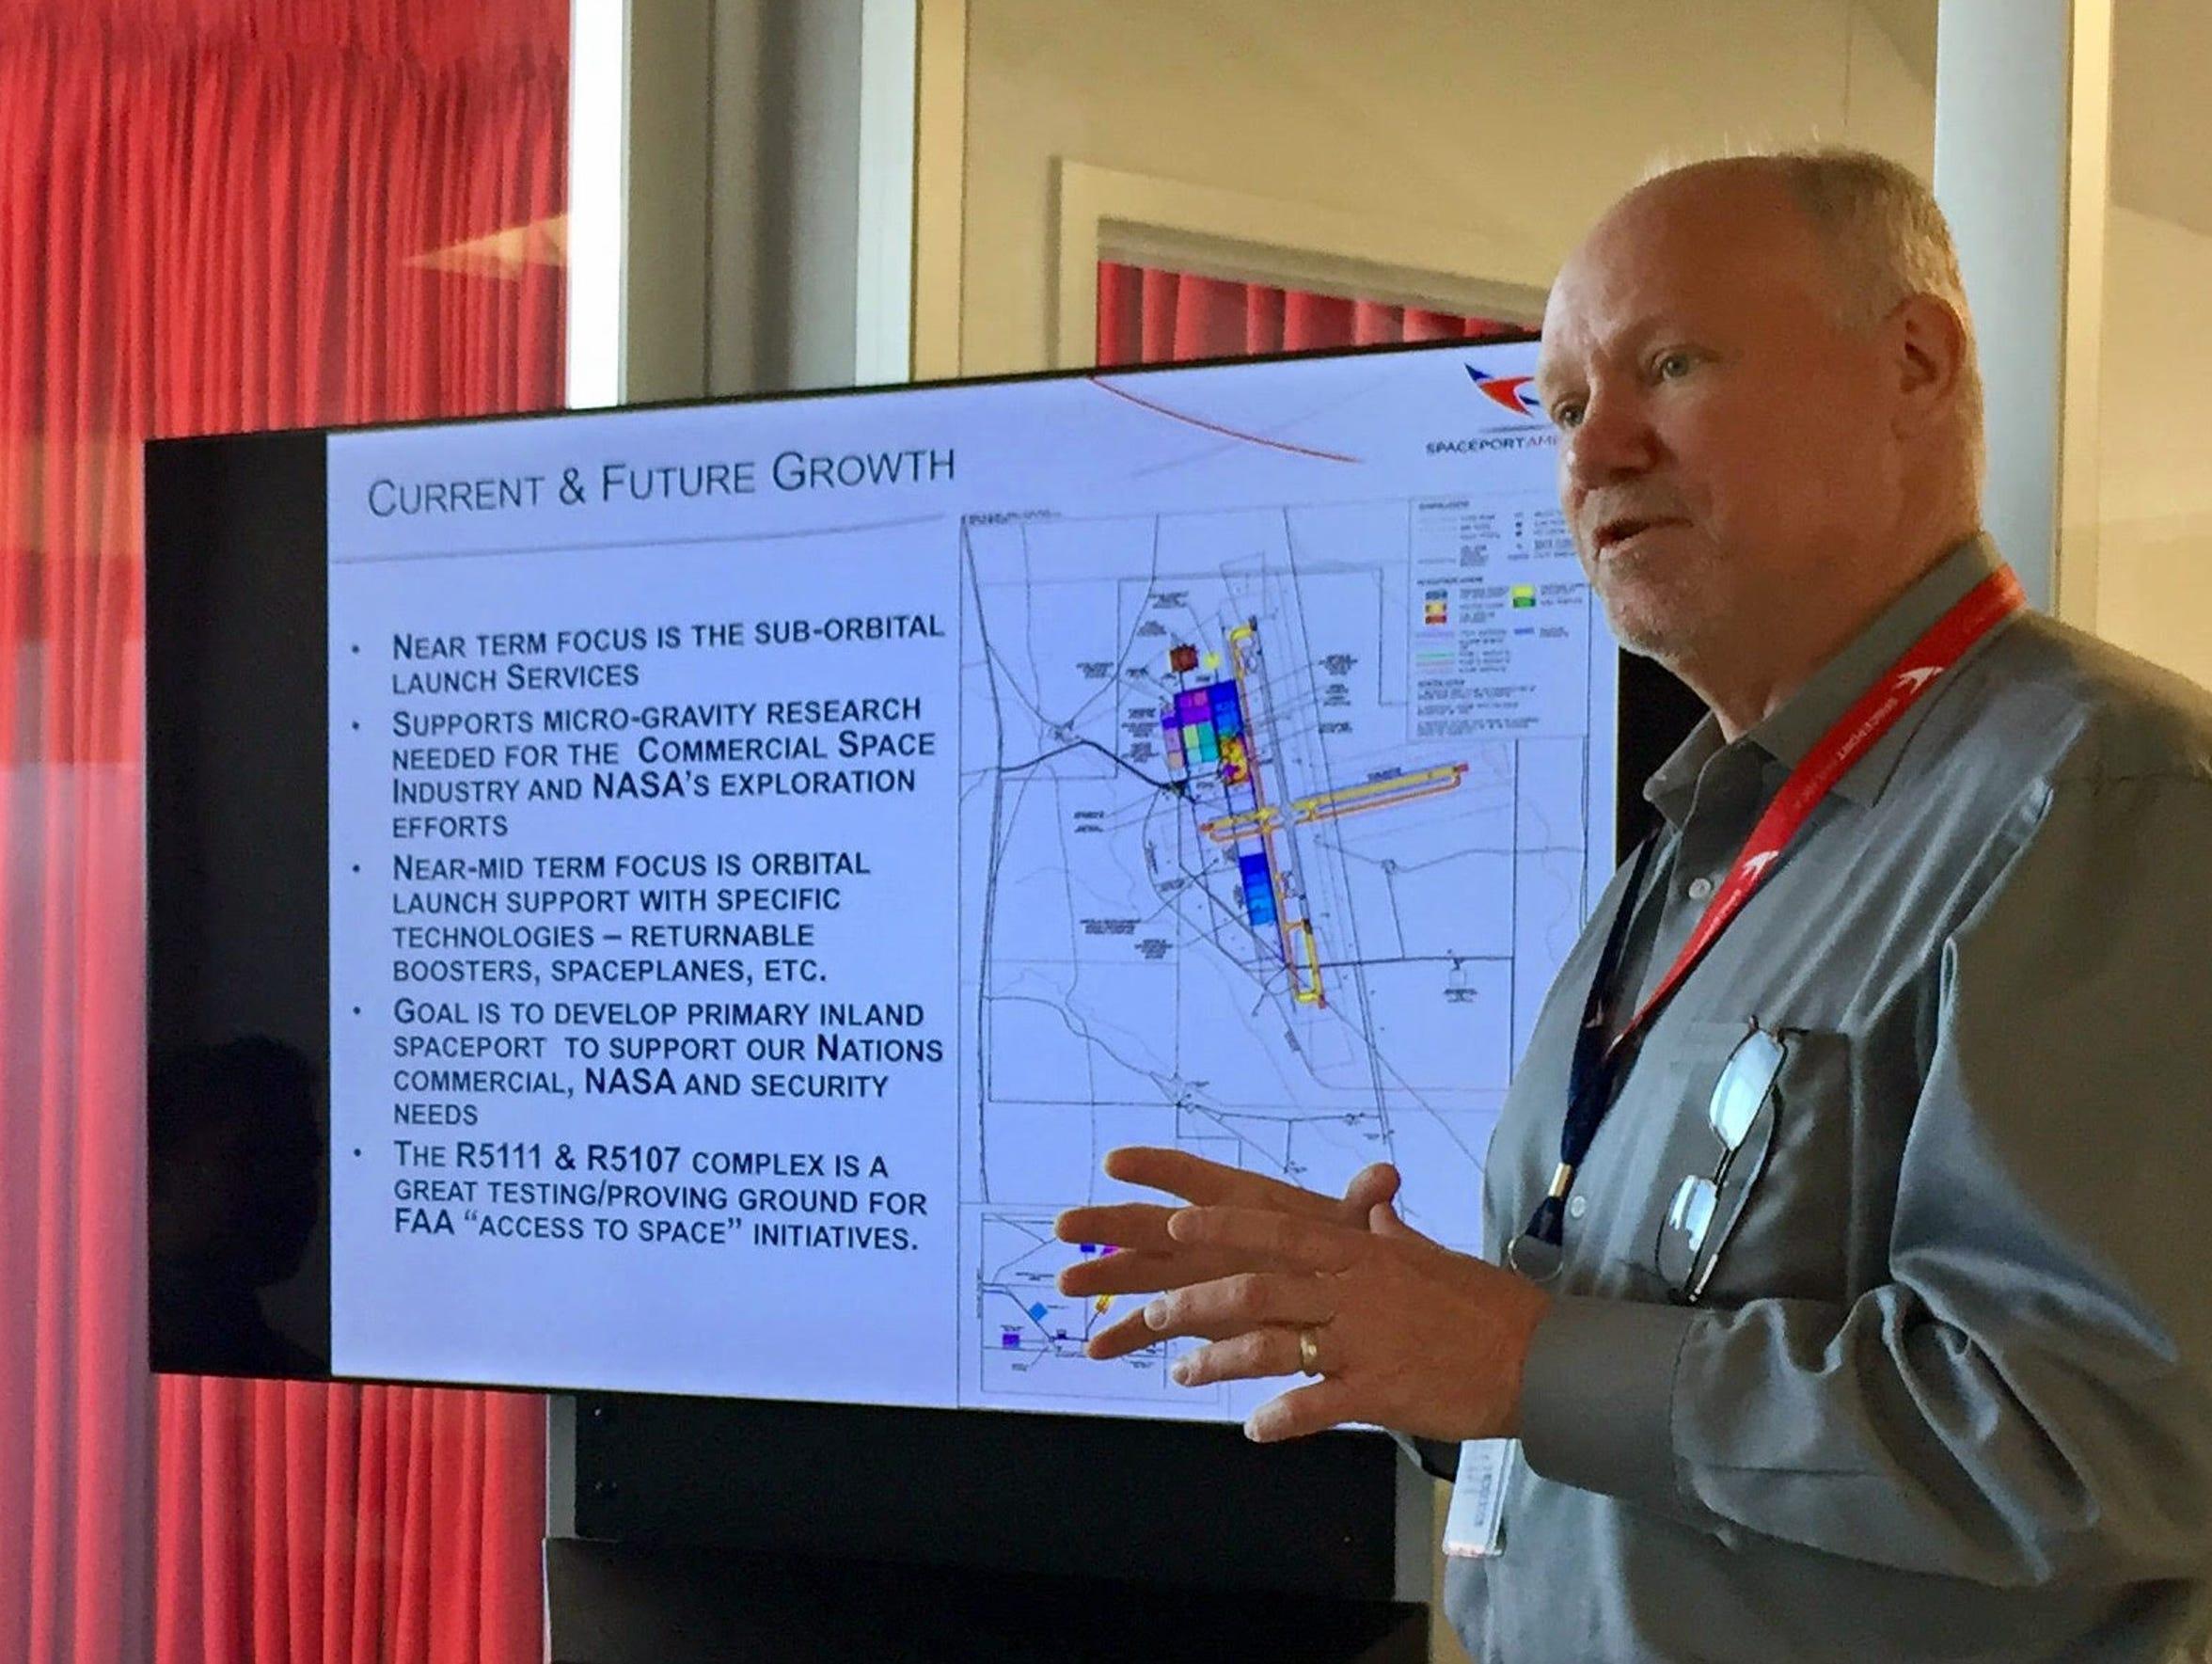 Spaceport America CEO Dan Hicks discusses the spaceport's